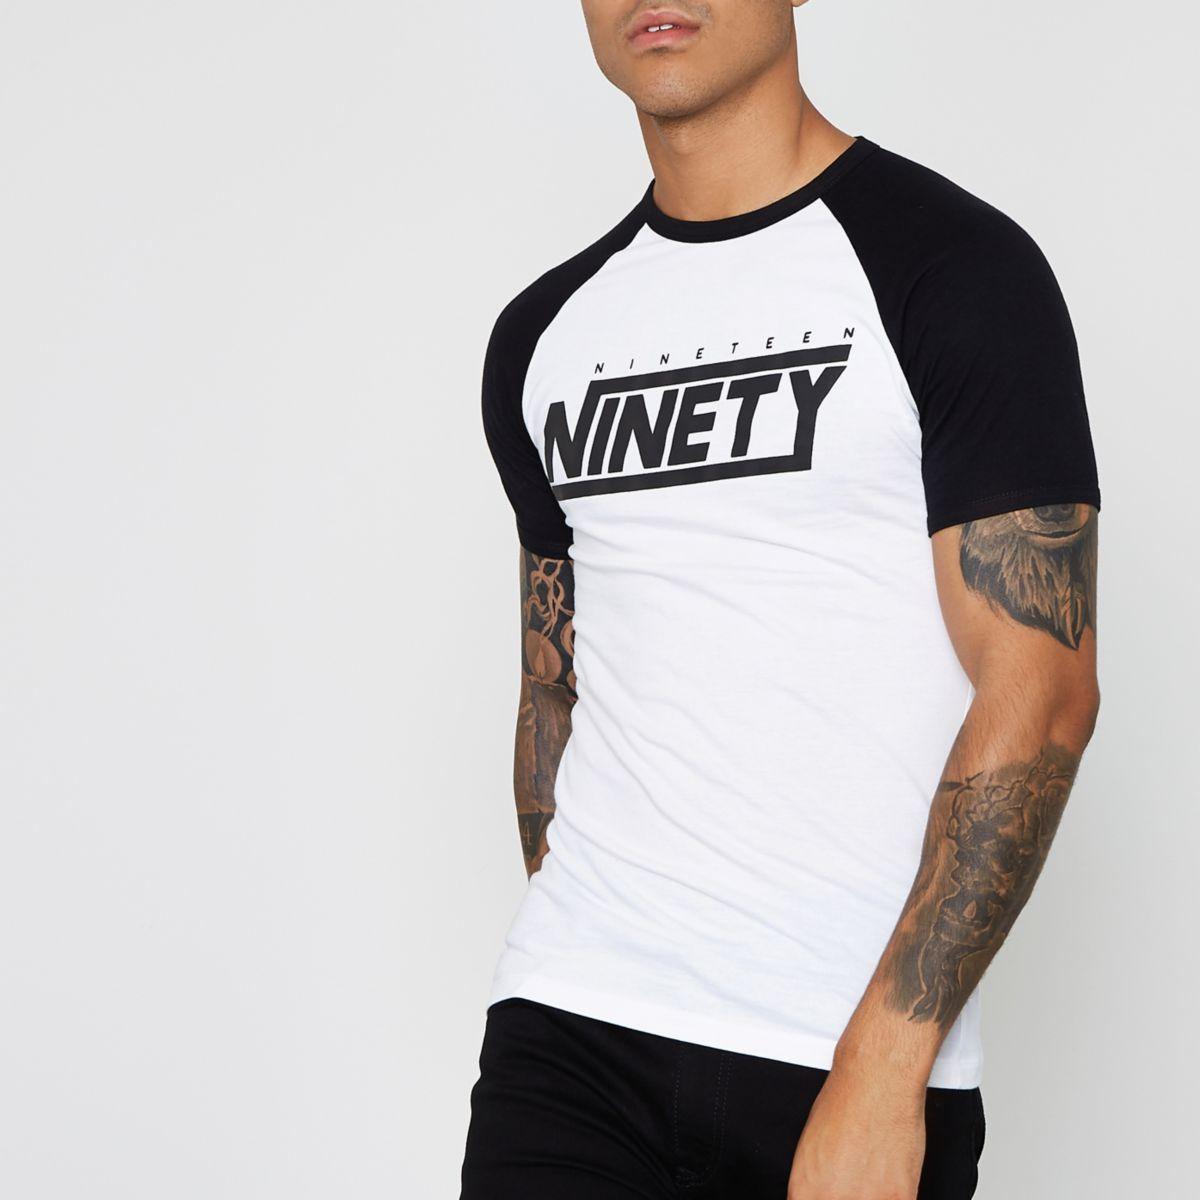 White 'nineteen ninety' raglan sleeve T-shirt